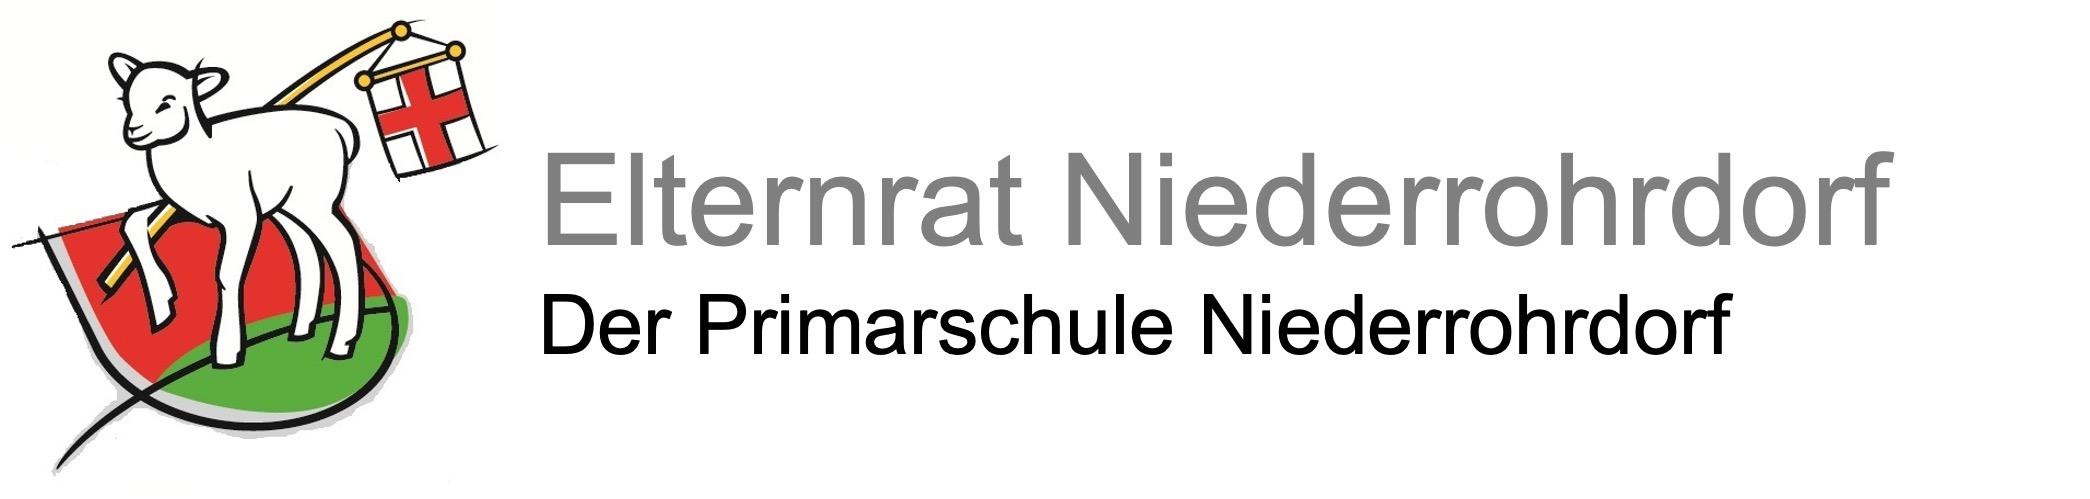 Elternrat Niederrohrdorf